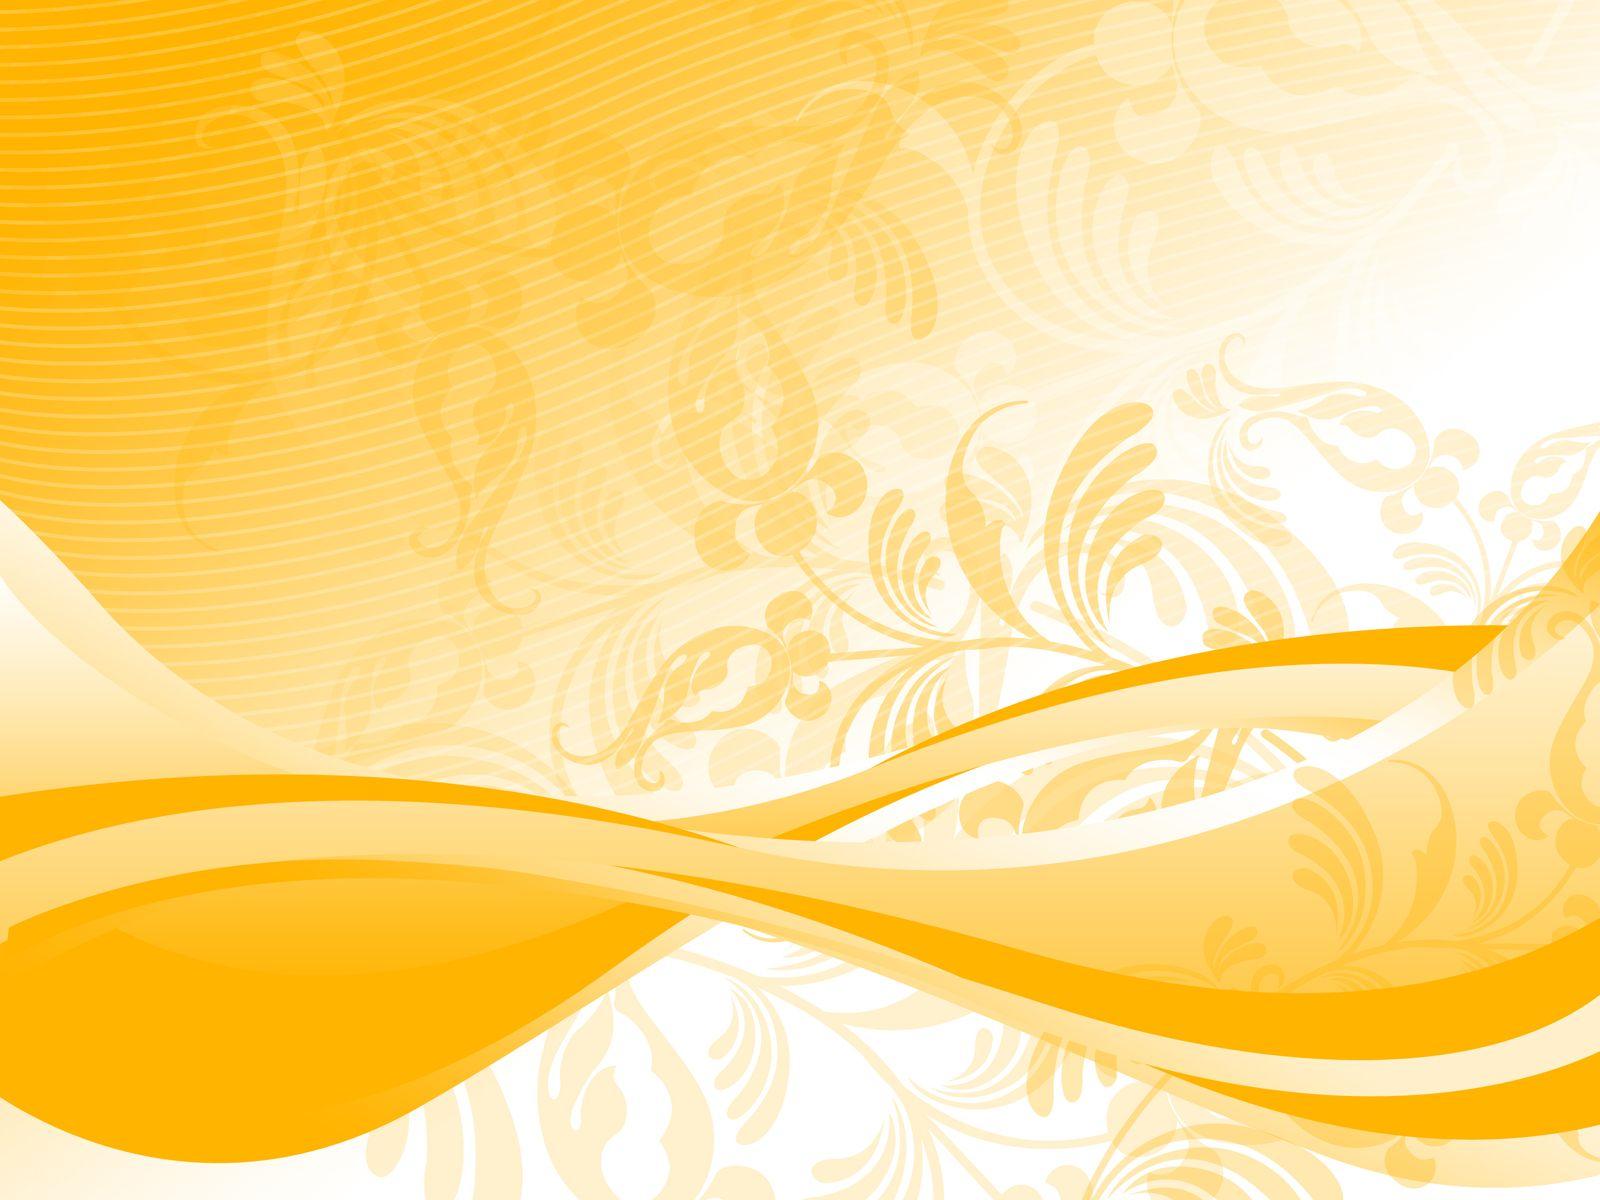 Orange HD Wallpapers Backgrounds Wallpaper Abstrakte